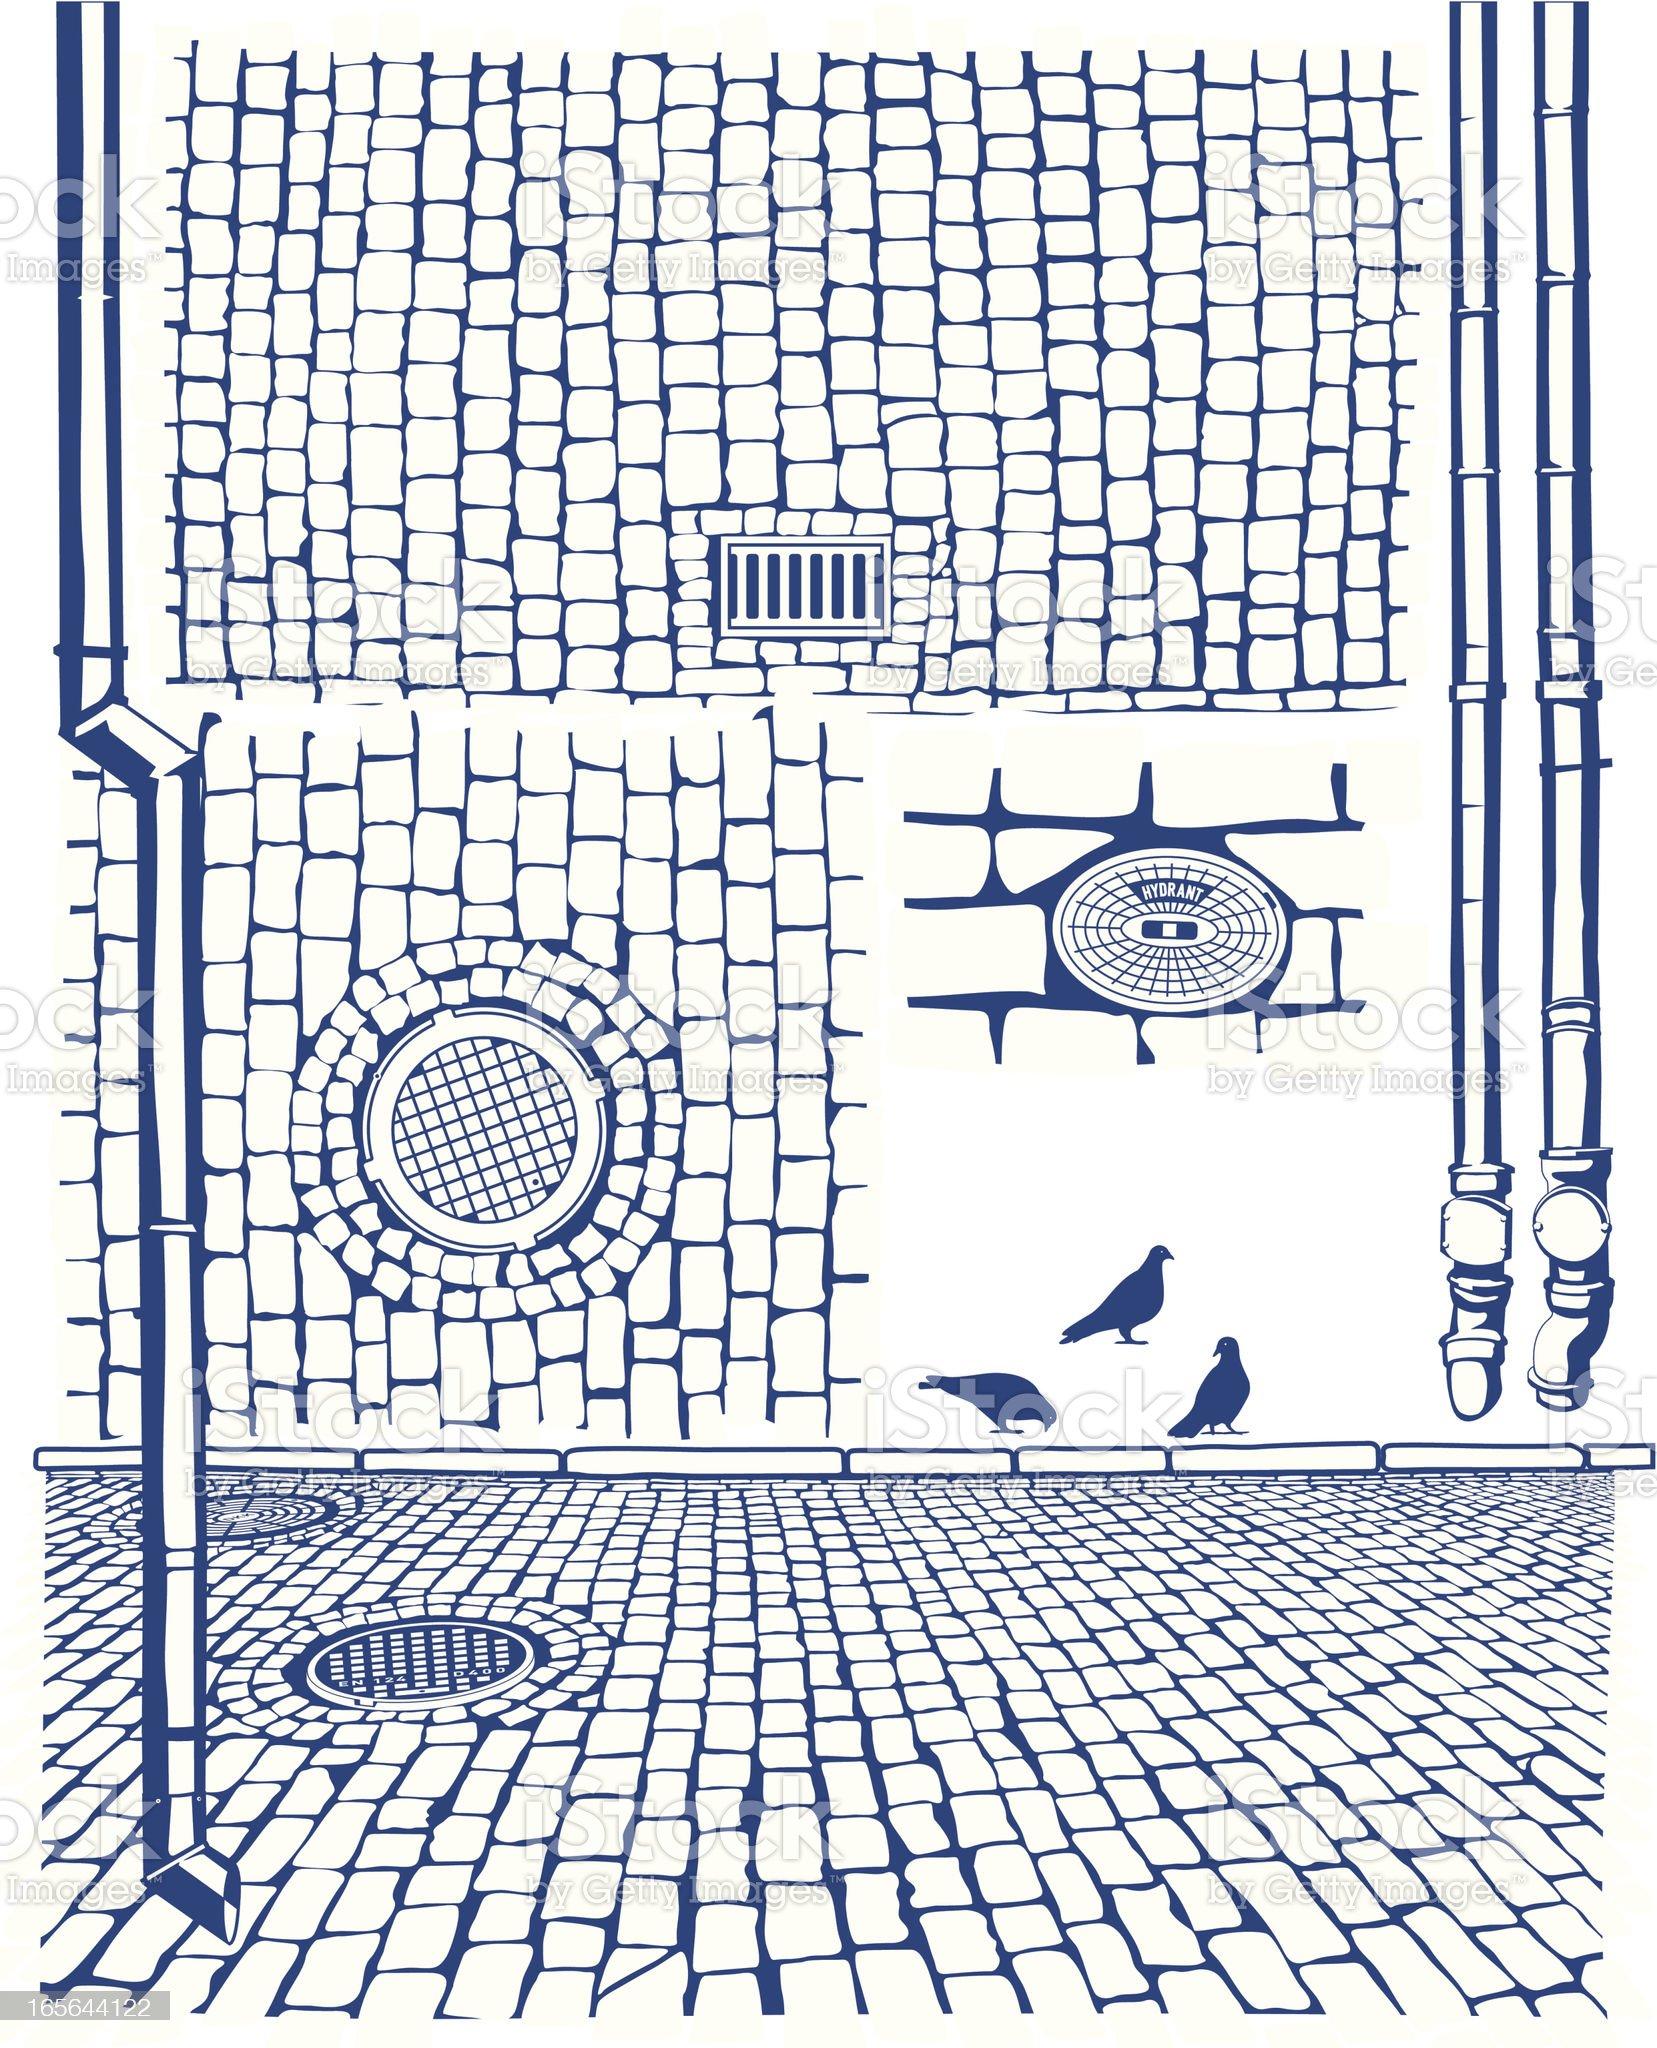 Drains & Cobbles royalty-free stock vector art